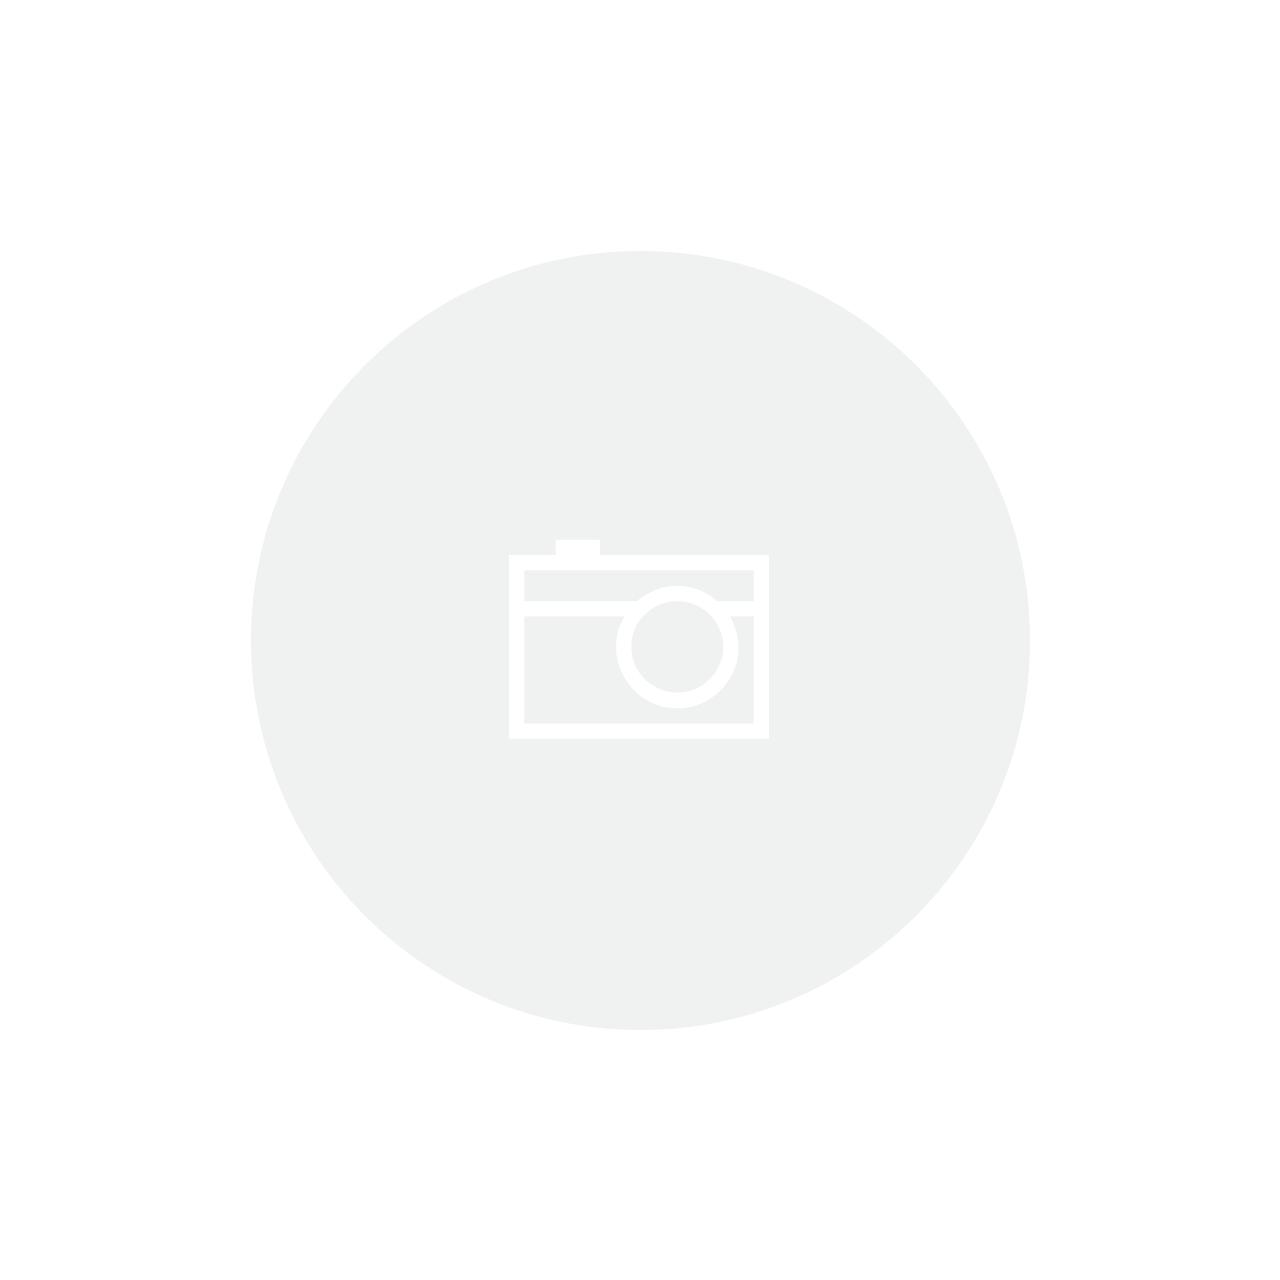 Espumadeira Aço Inox 53Cm Tramontina